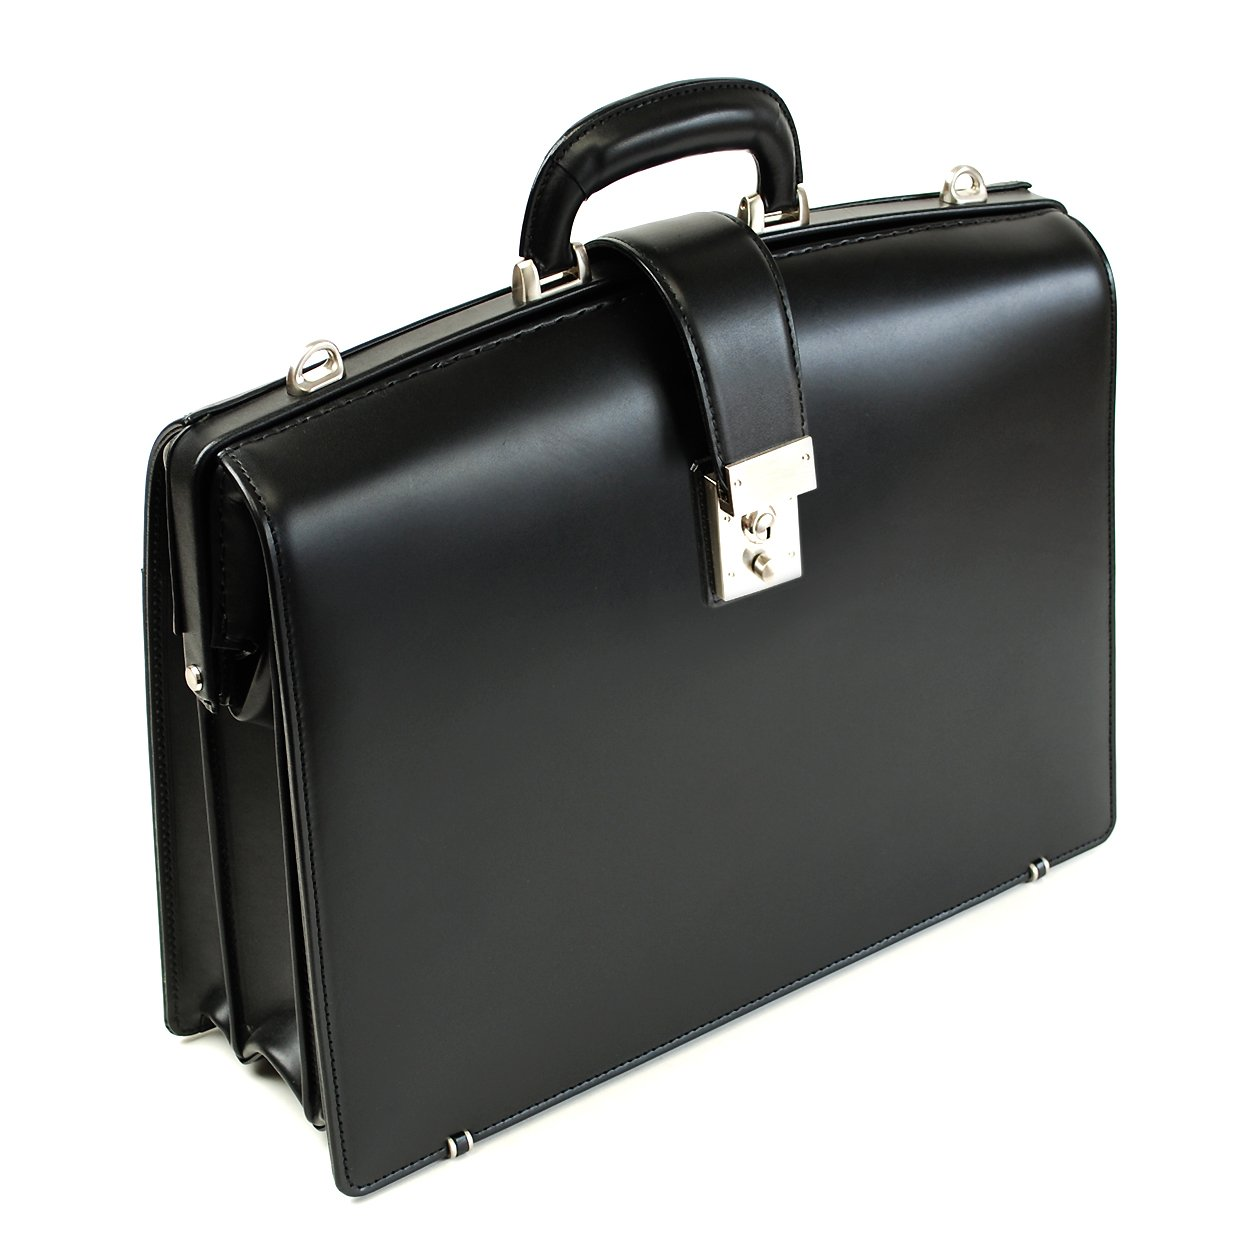 LuggageAOKI1894 (青木鞄) Genius ジーニアス:A4サイズ 2way ダレスバッグ[AK-2558] (ブラック) B00BP2MIU2